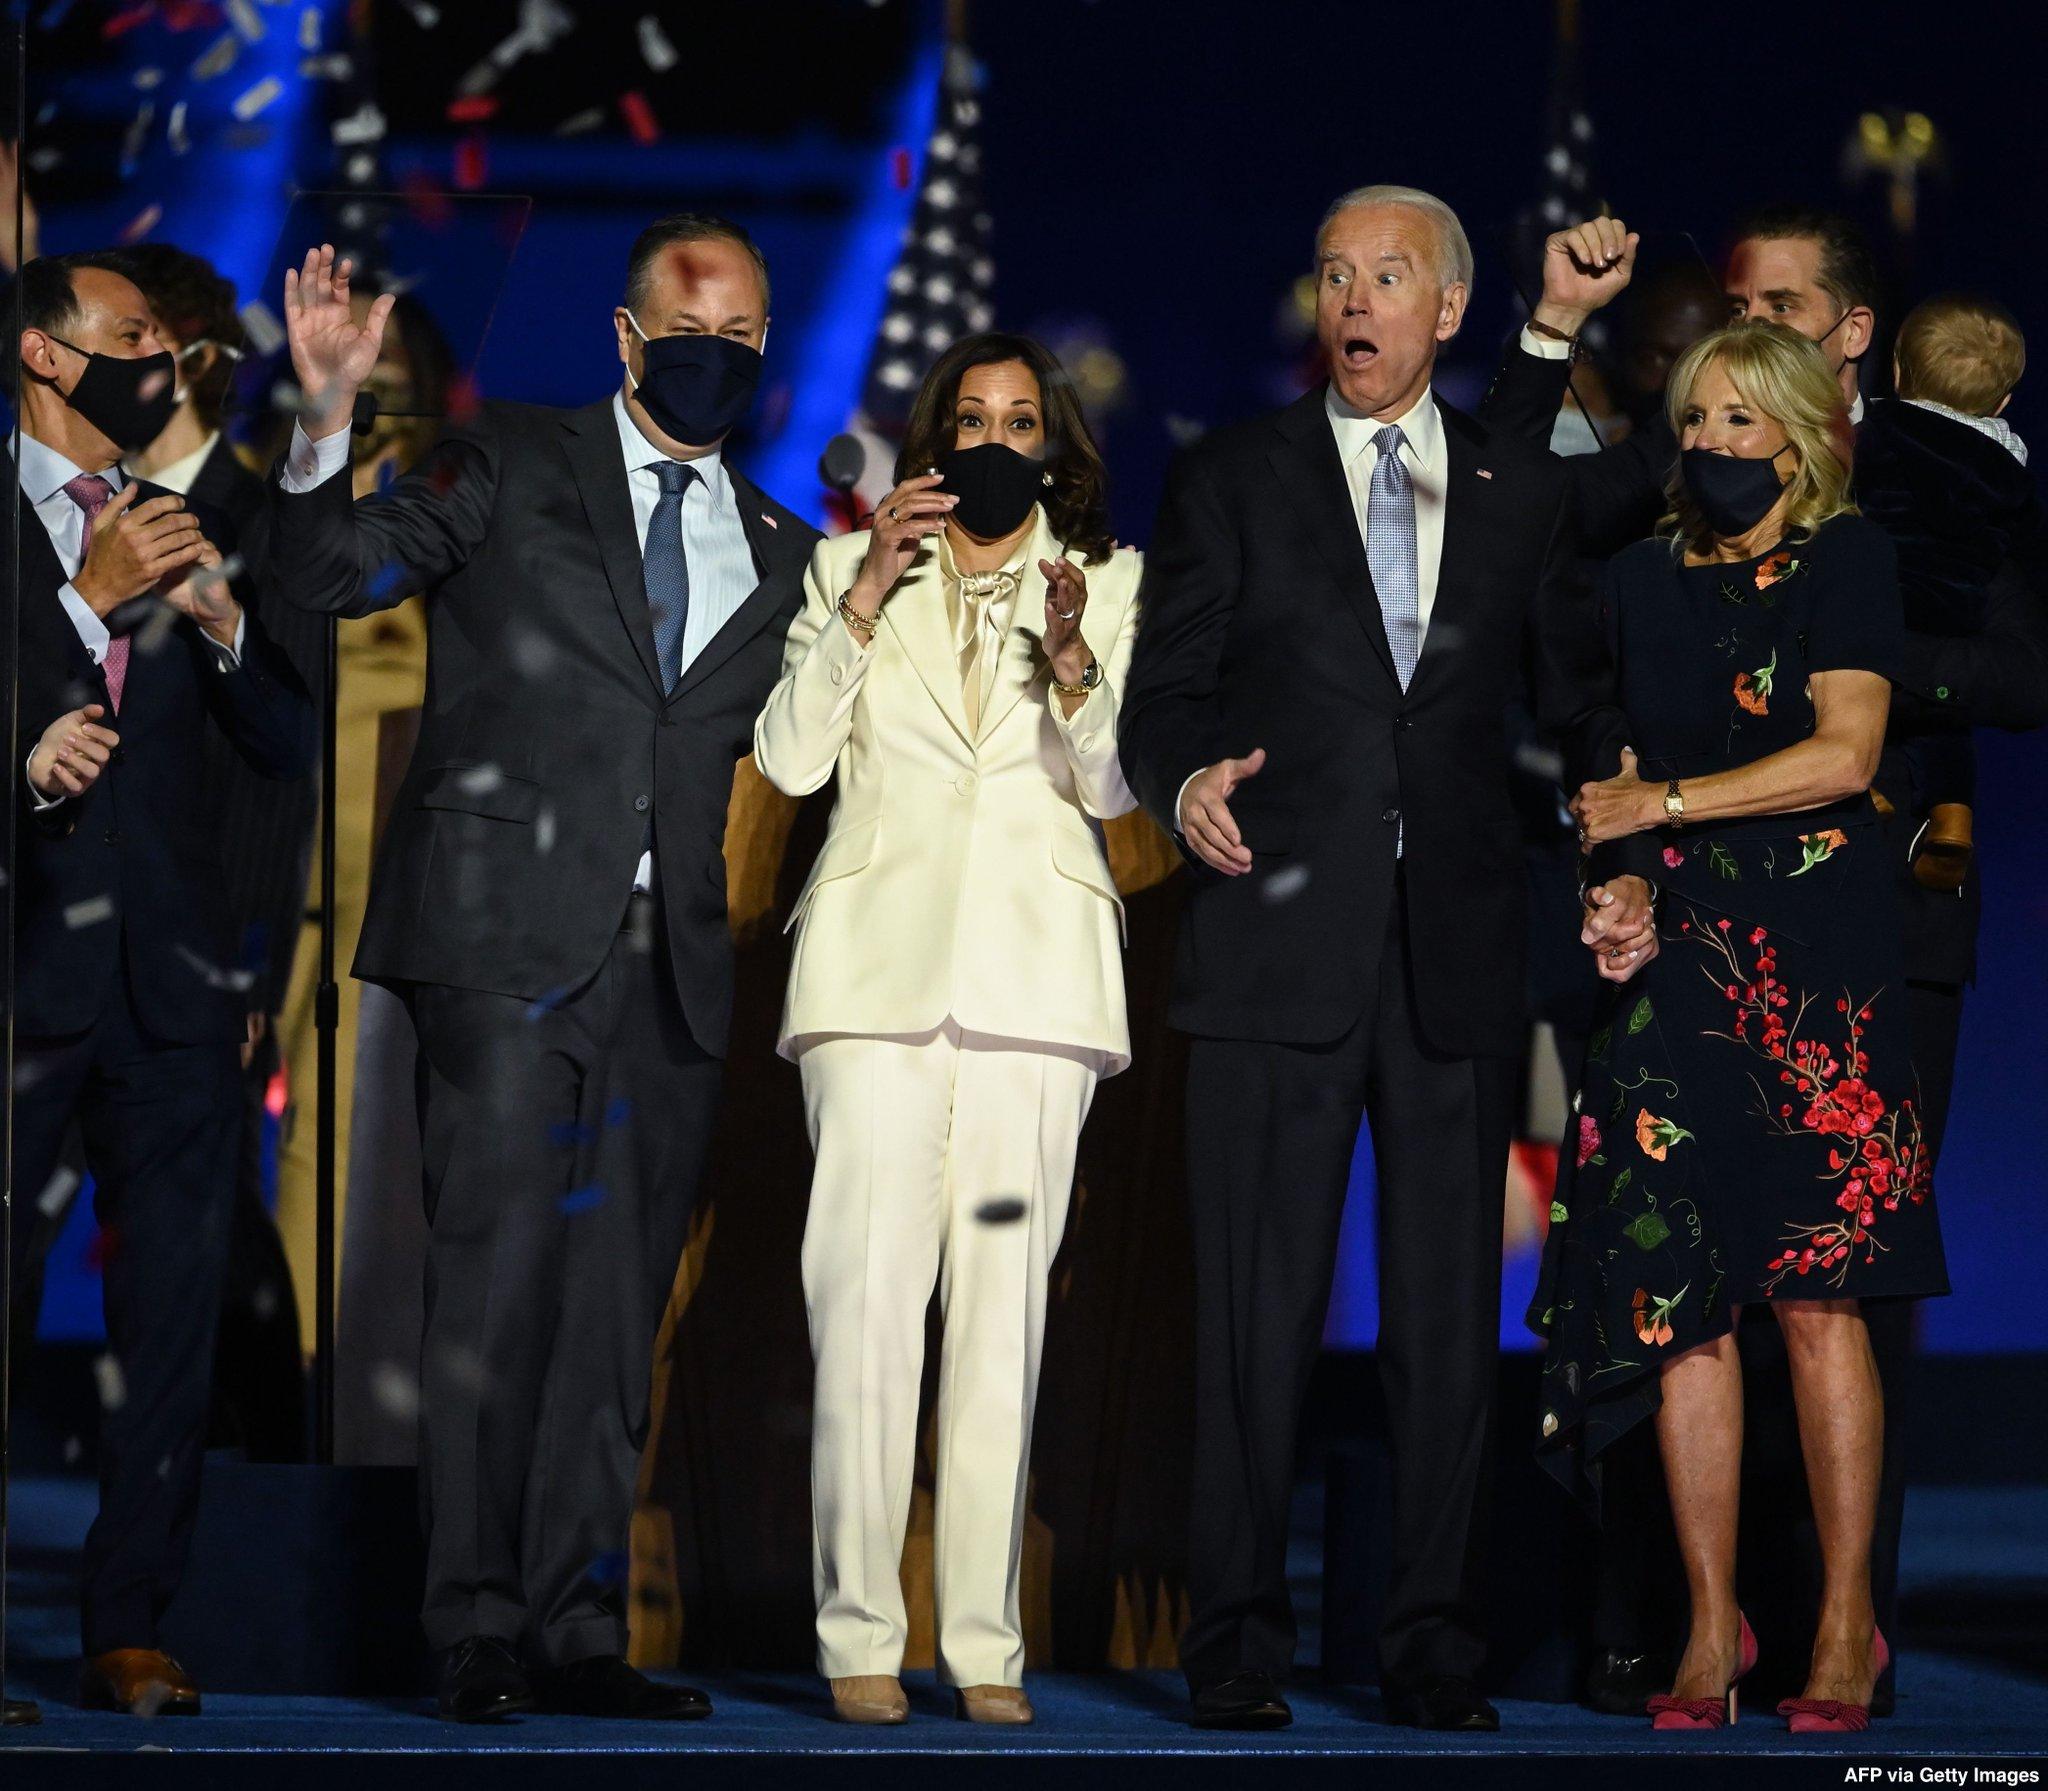 Dr Jill Biden Makes Her First Appearance Wearing Oscar De La Renta Front Row Edit By Cameron Tewson